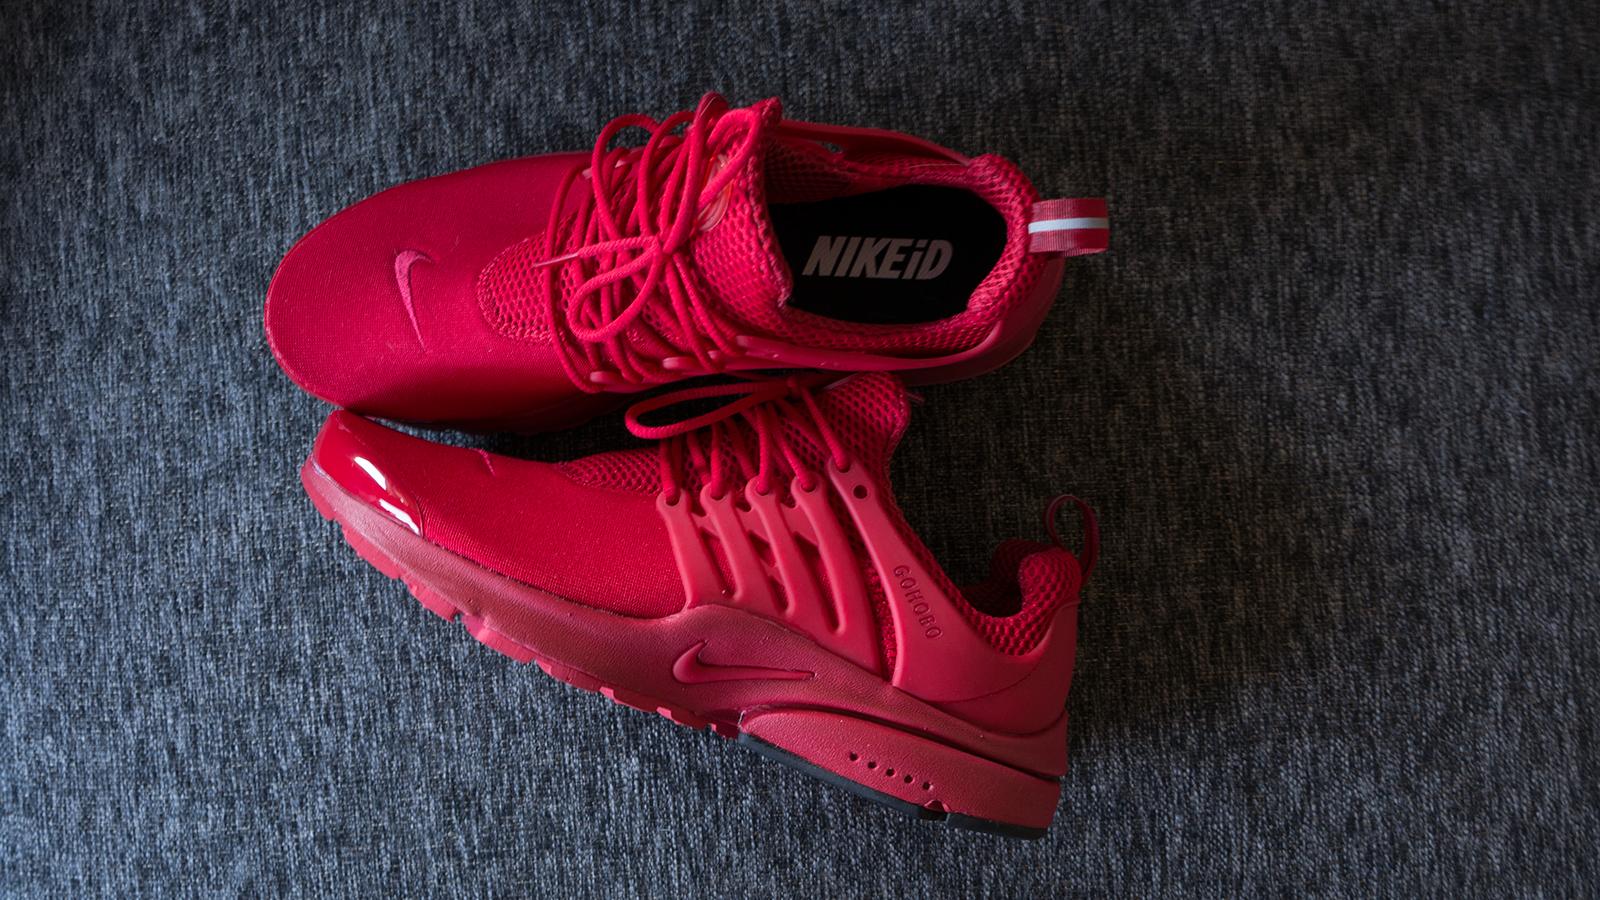 Hobo Life Nike Presto Red October OG